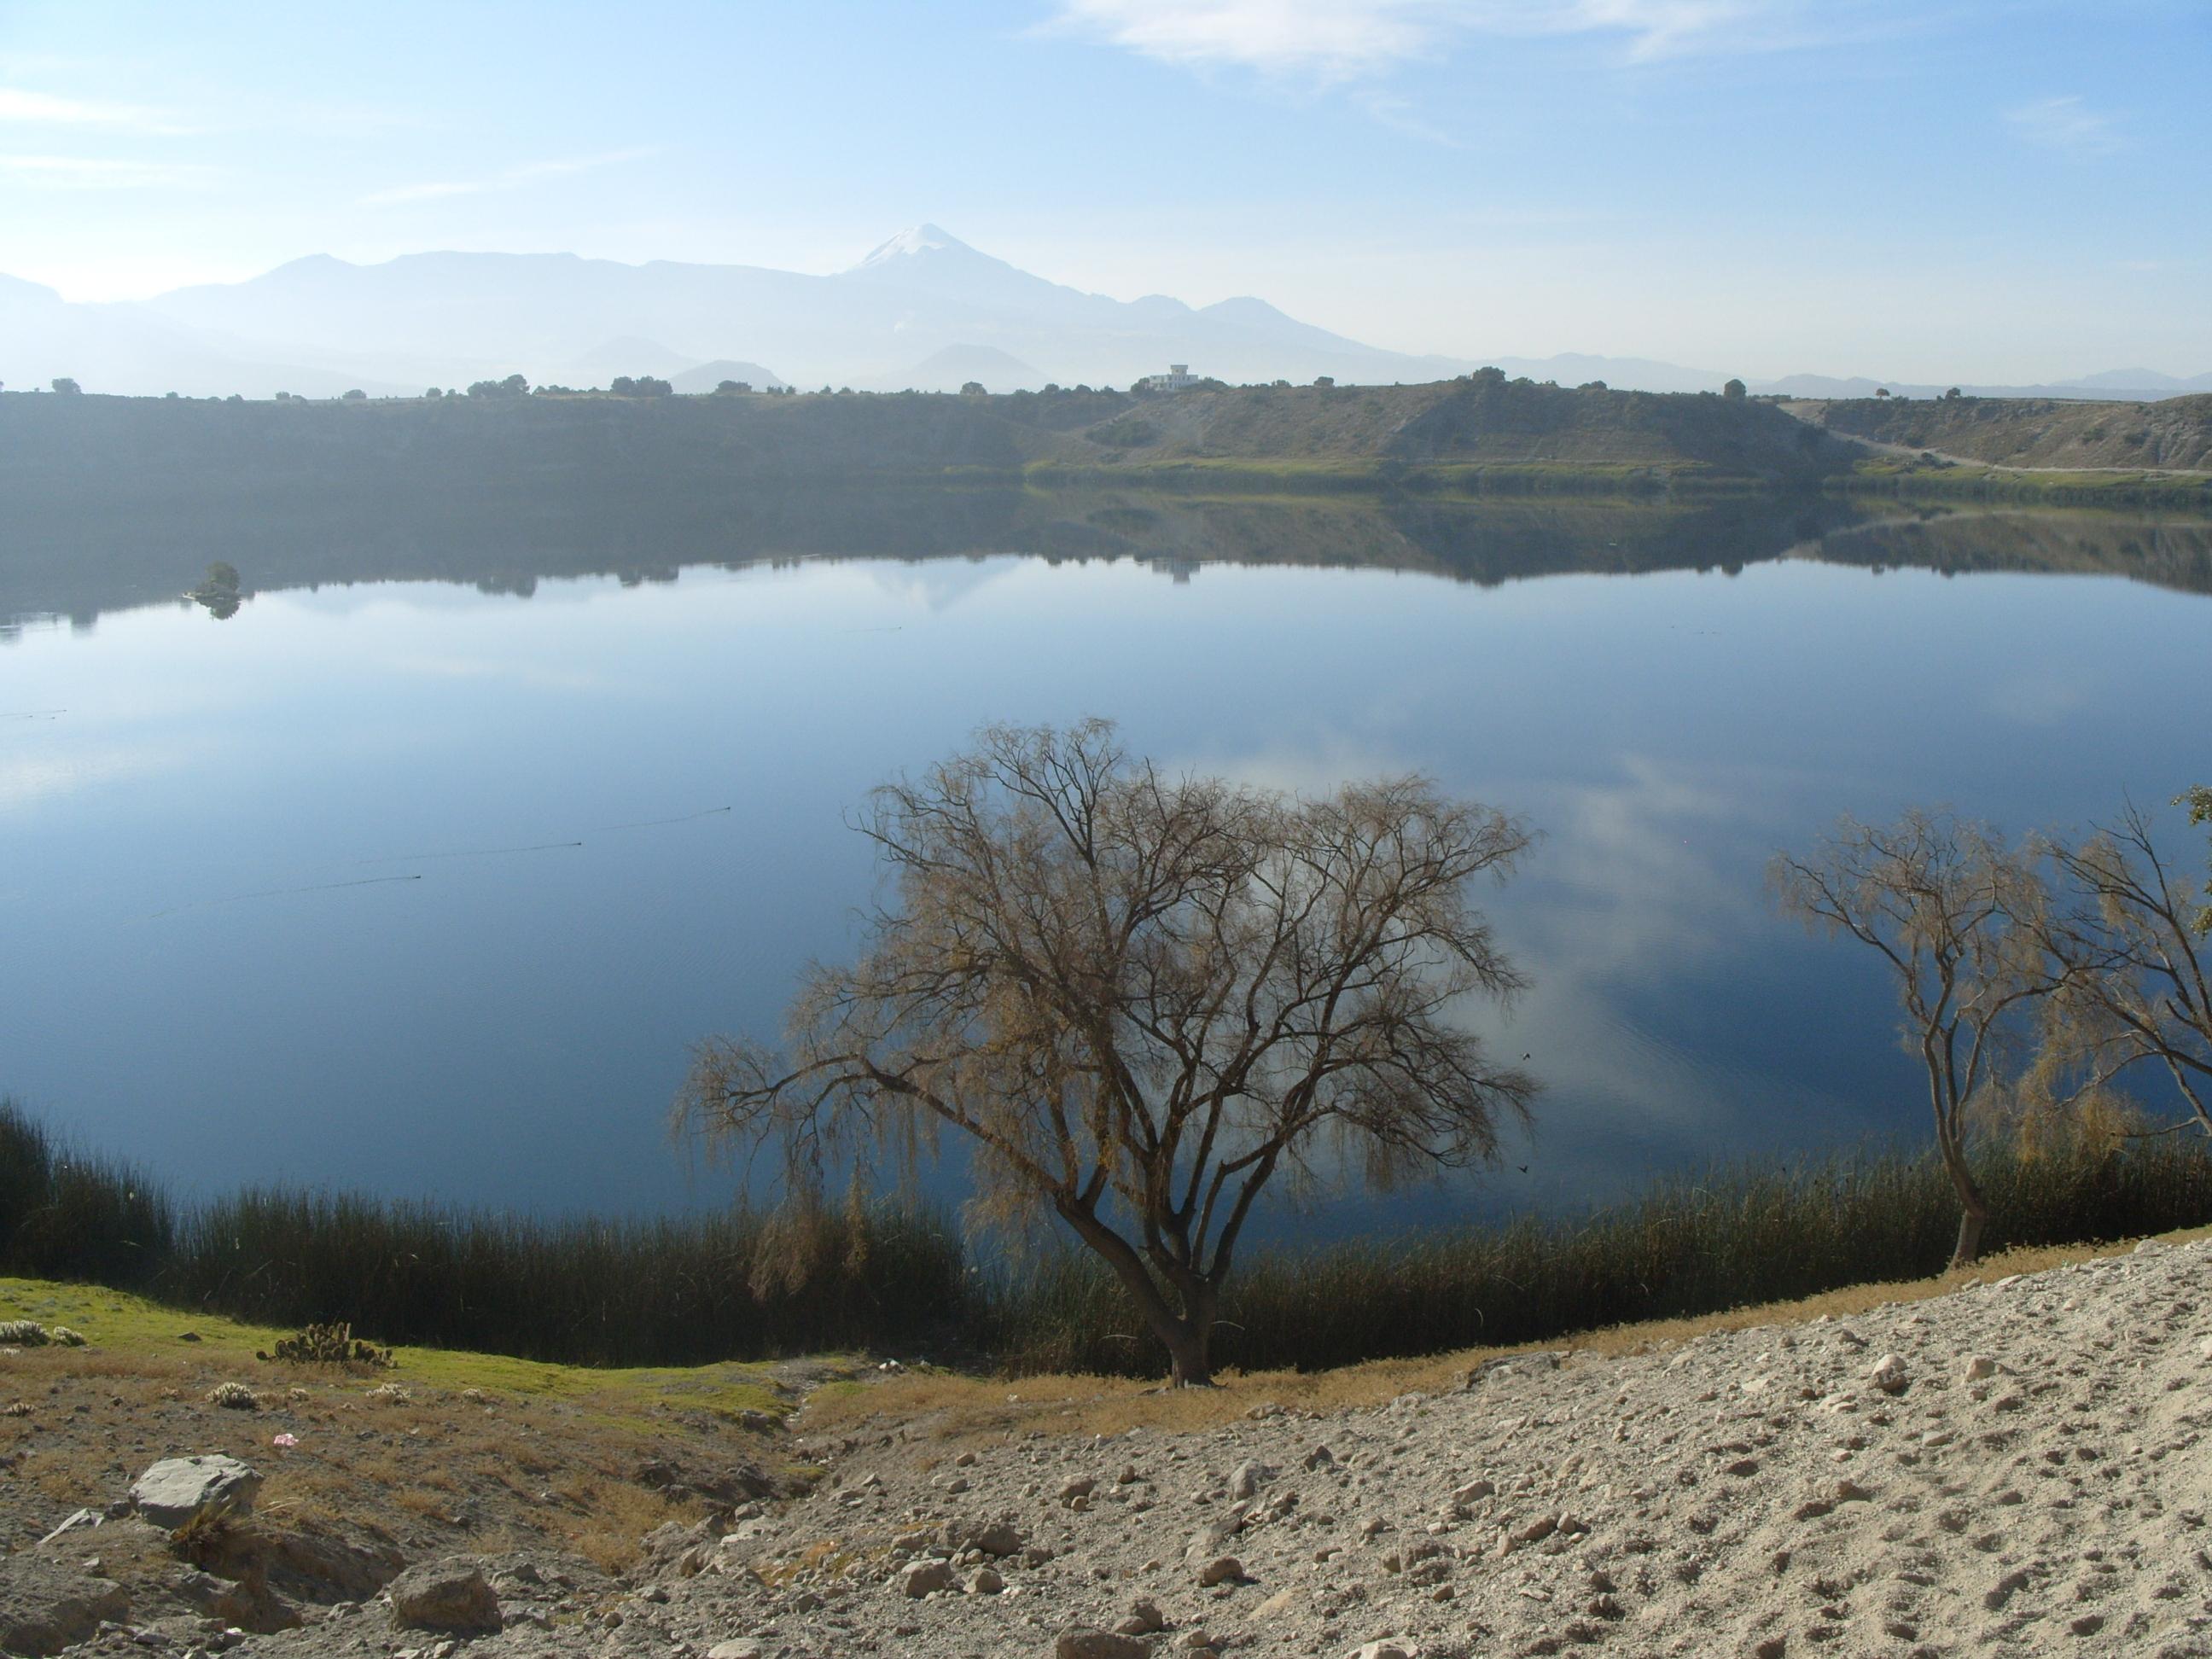 Laguna de Quechulac